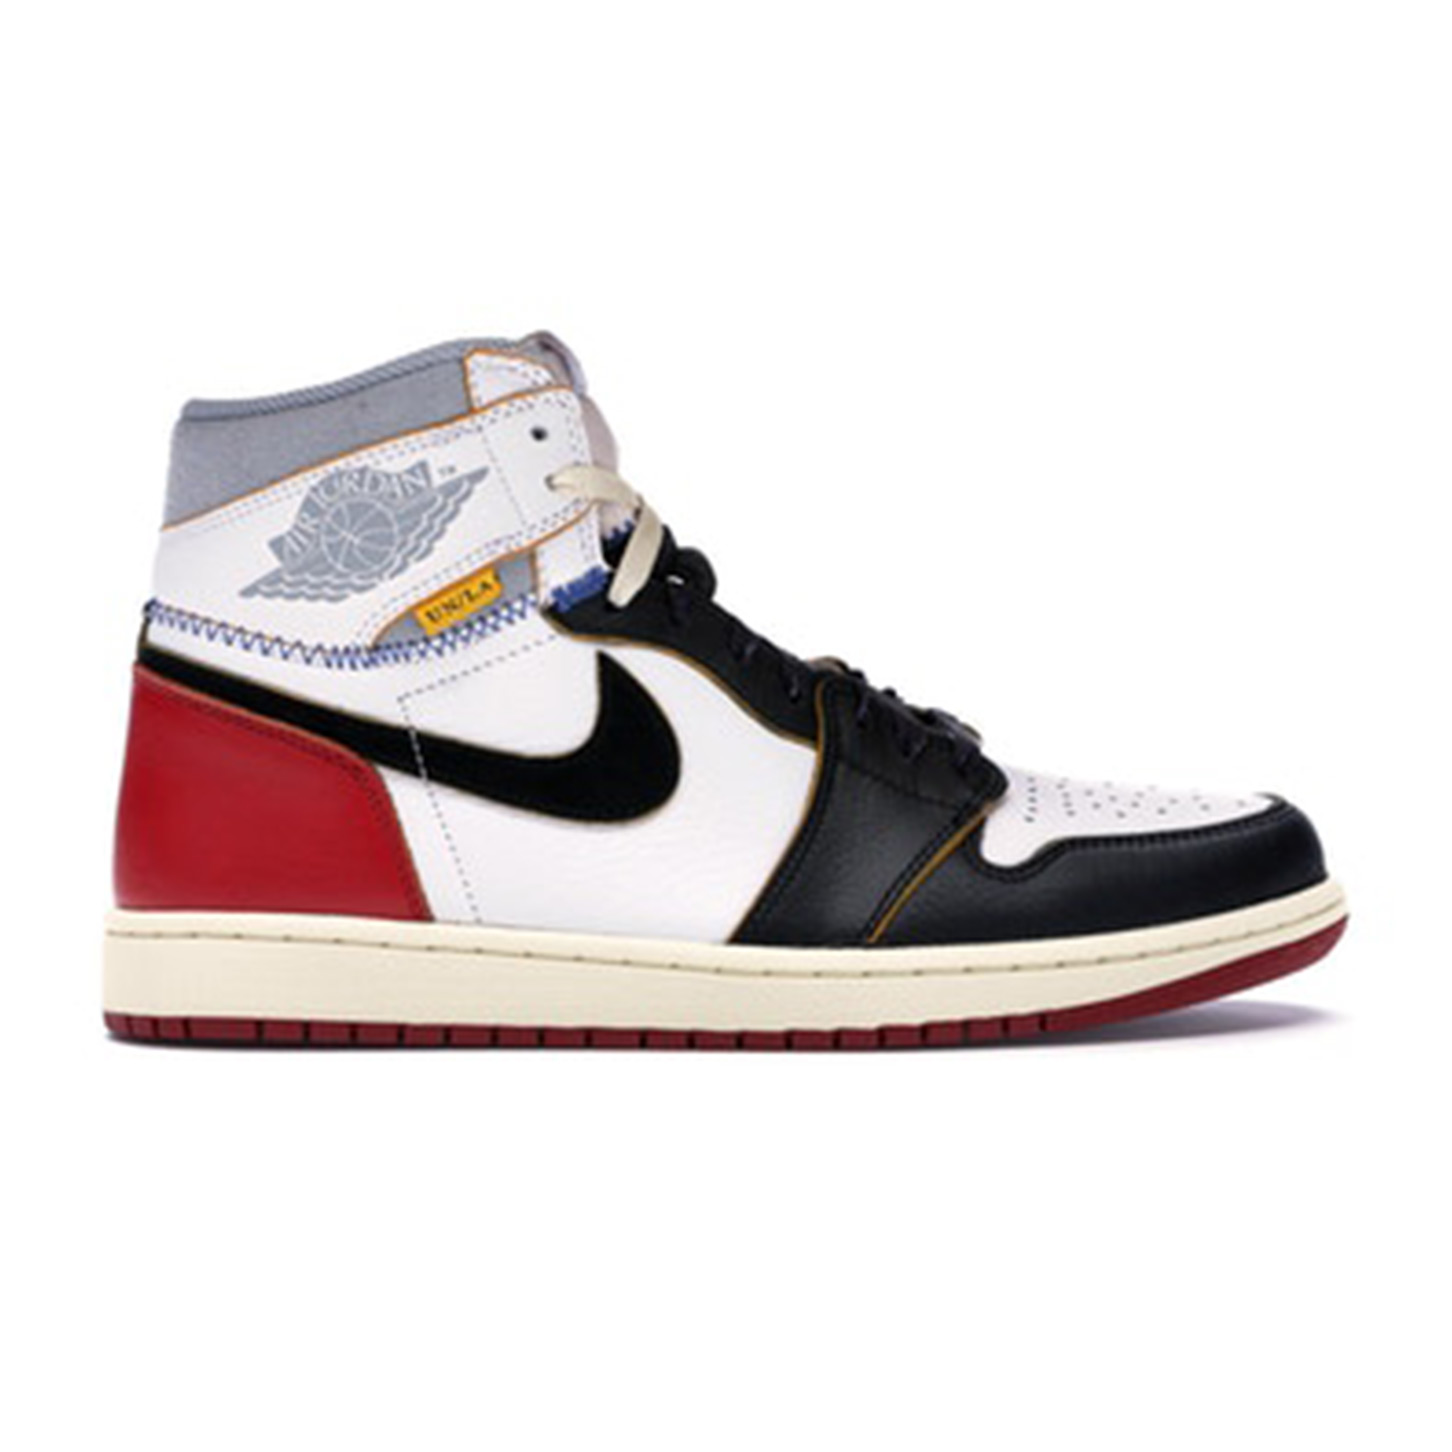 Jordan 1 Retro High Union Los Angeles Black Toe